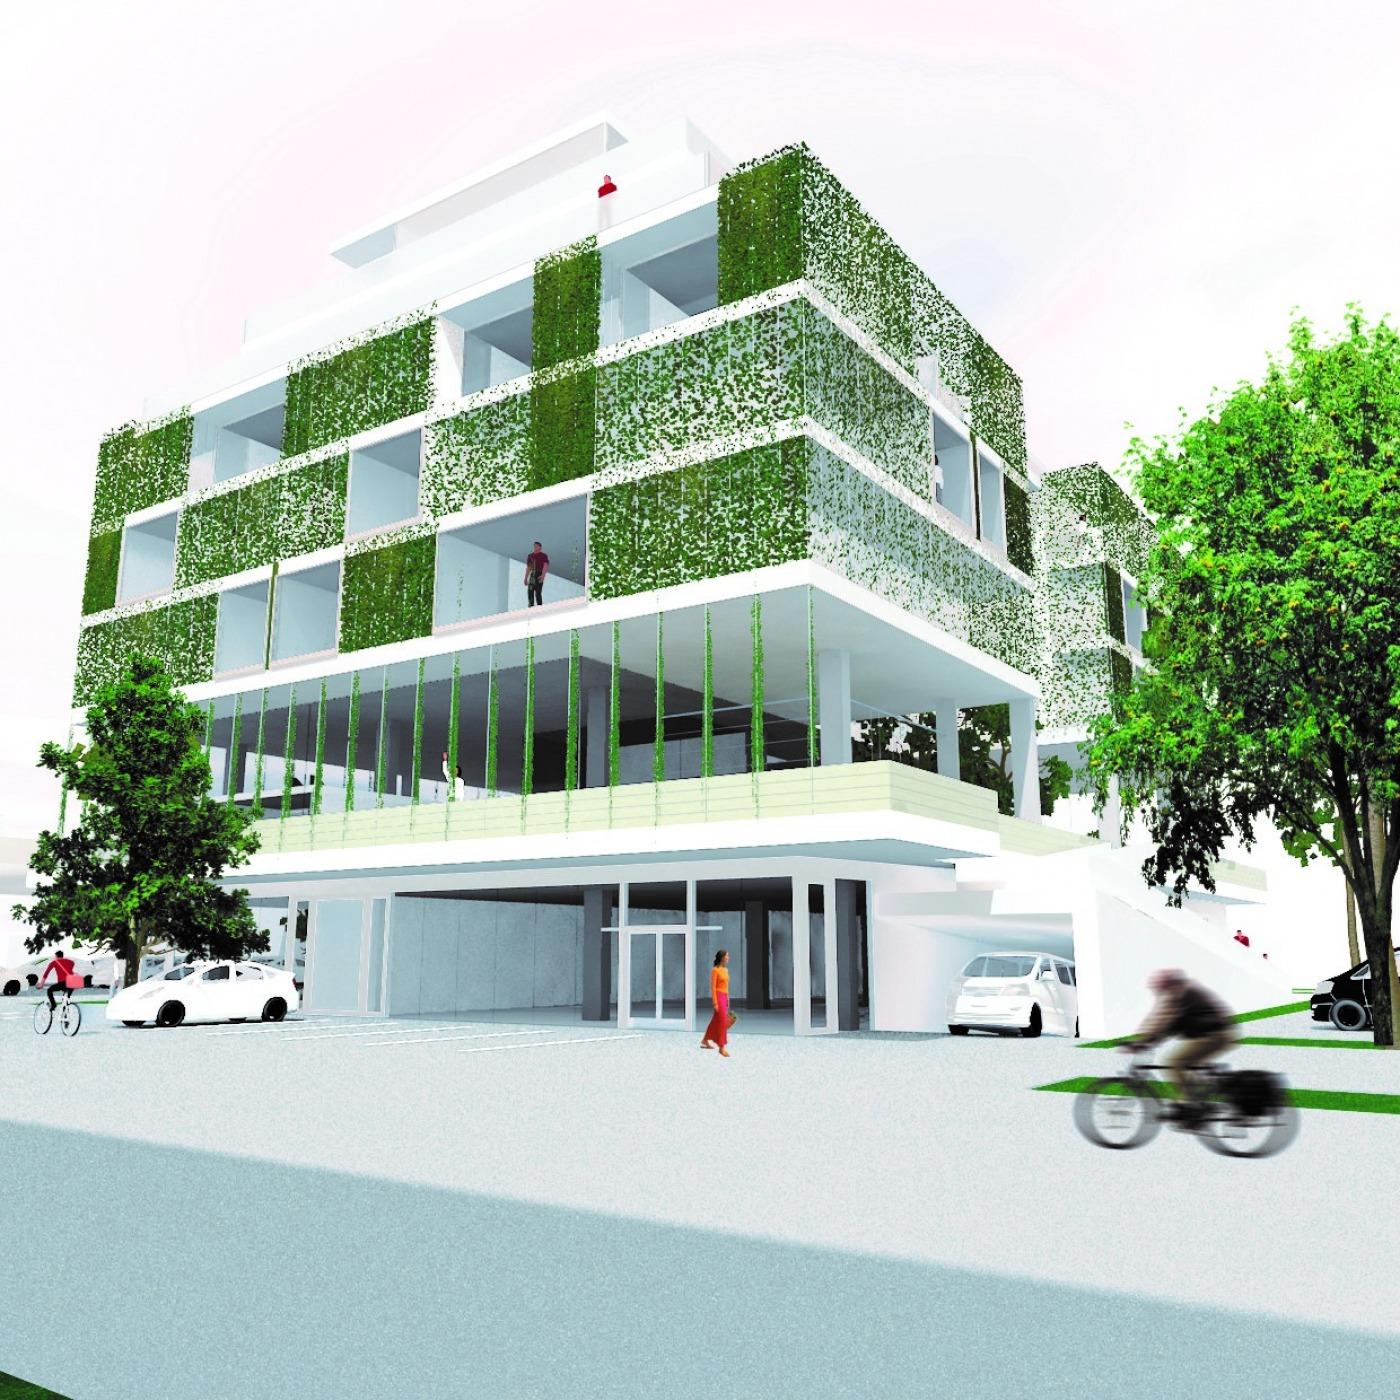 2019, Cohousing Holzstraße